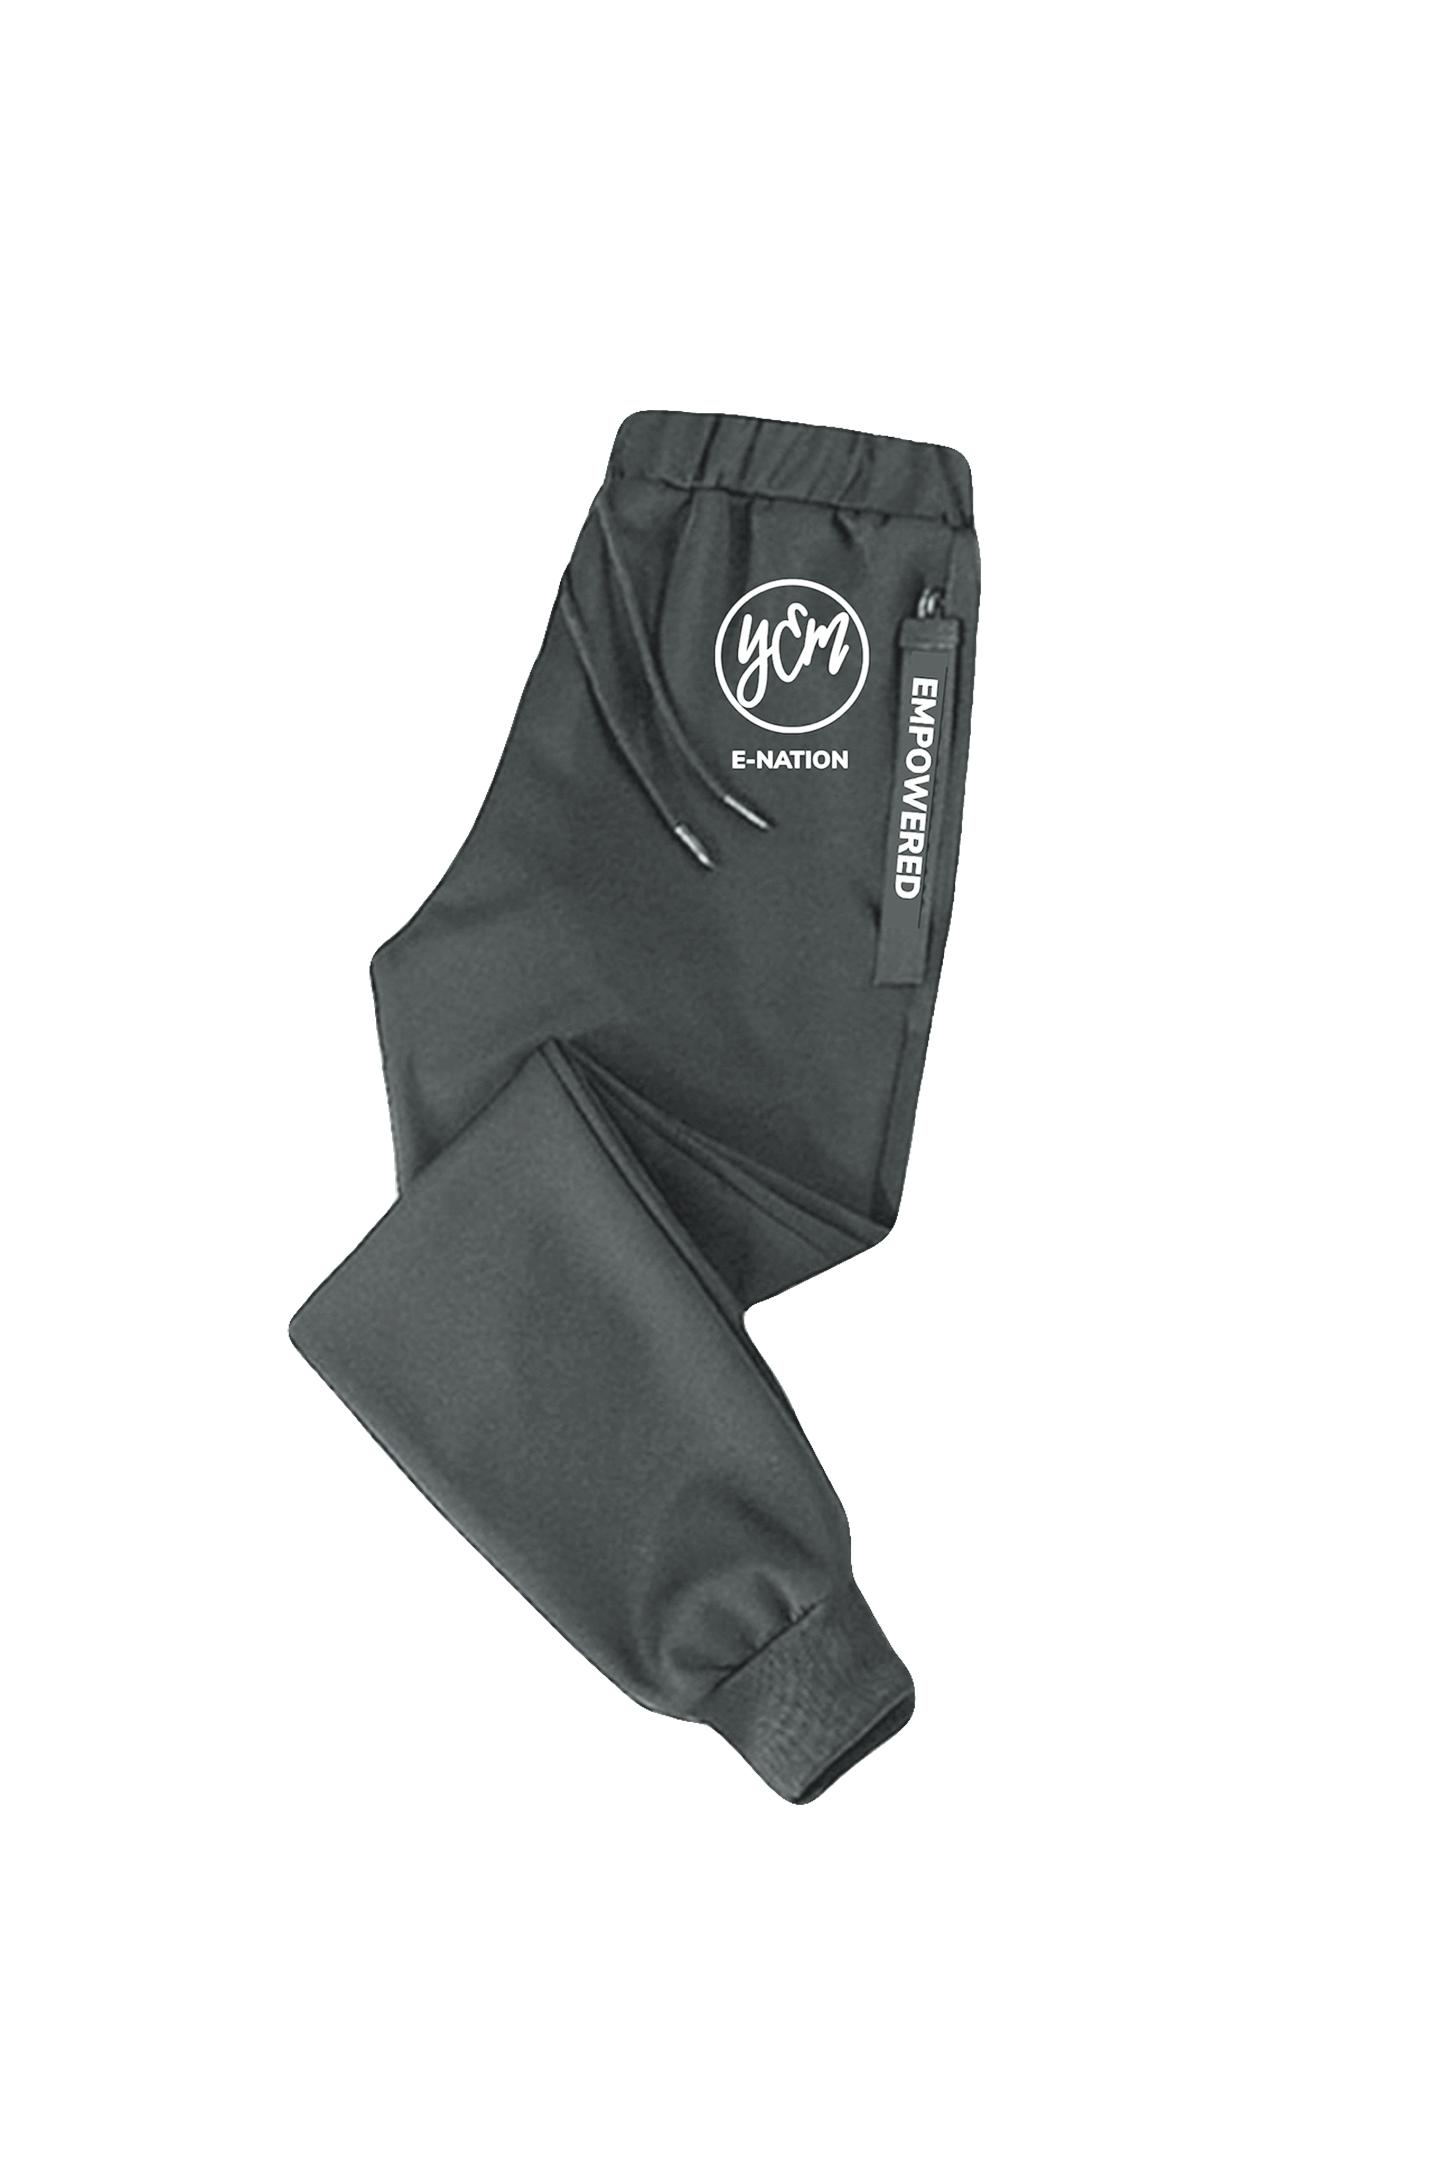 YEM Empowered Sweatsuit Jogger